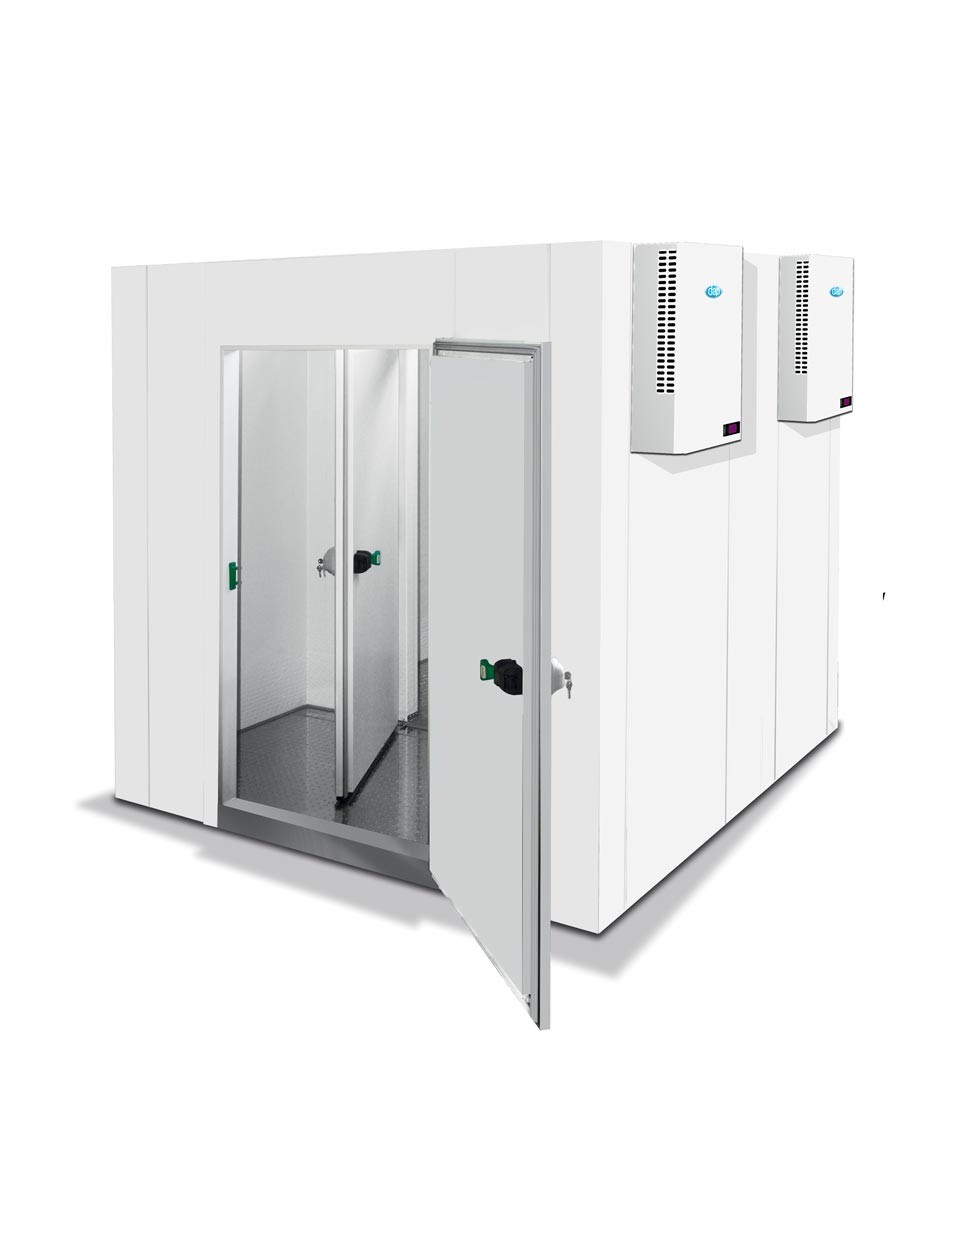 Chambres froides modulaires sans poteaux d'angles